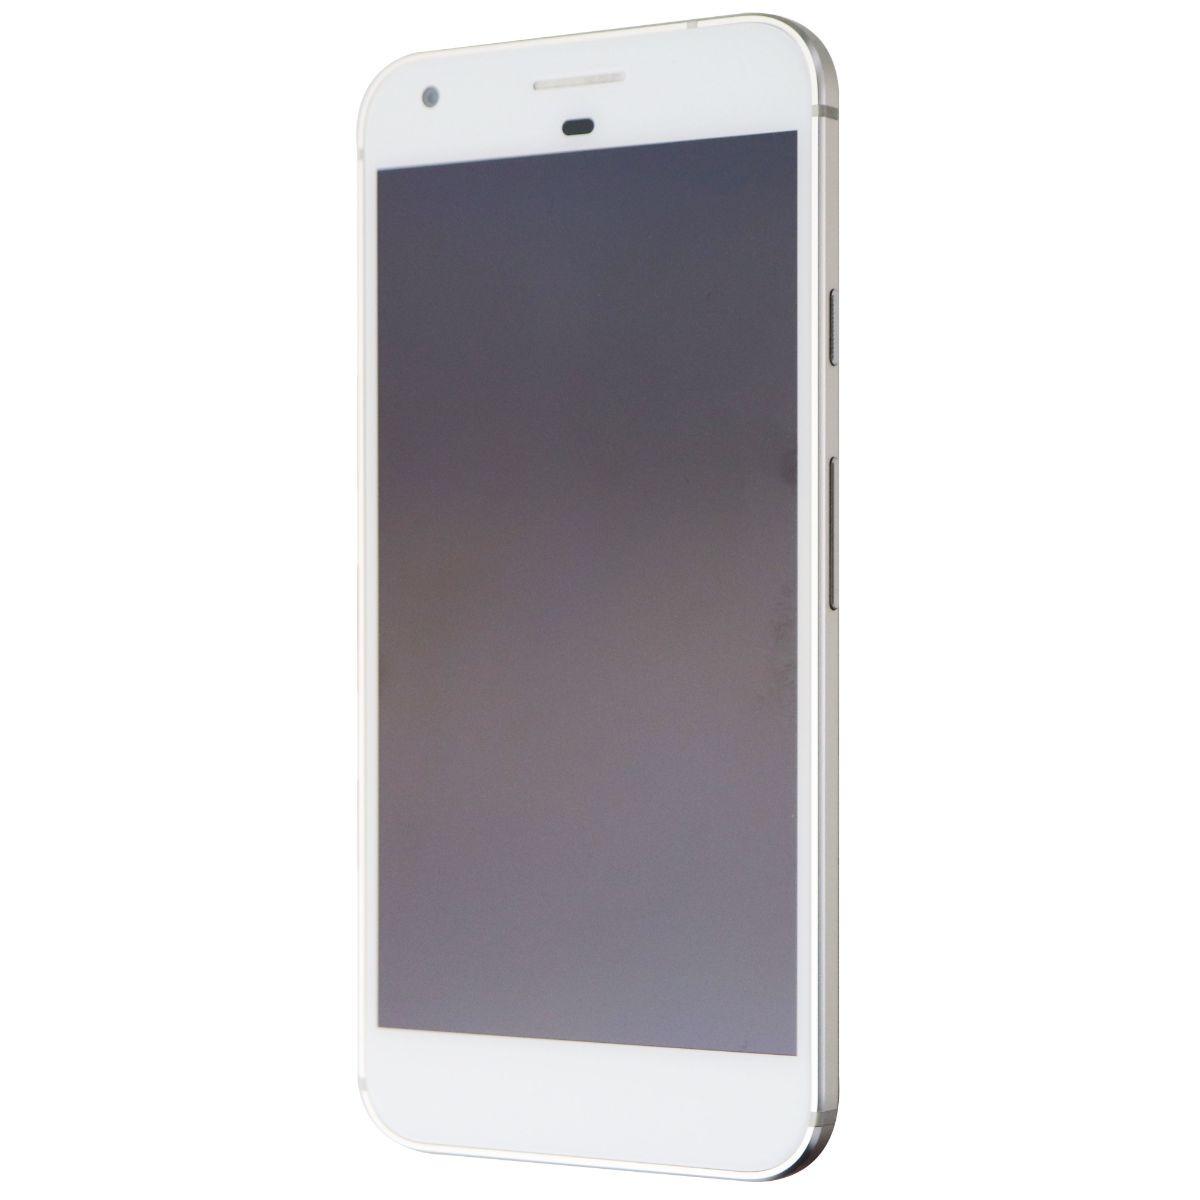 Google Pixel XL Phone 32GB Smartphone (G-2PW2100) - GSM + CDMA Unlocked - Silver